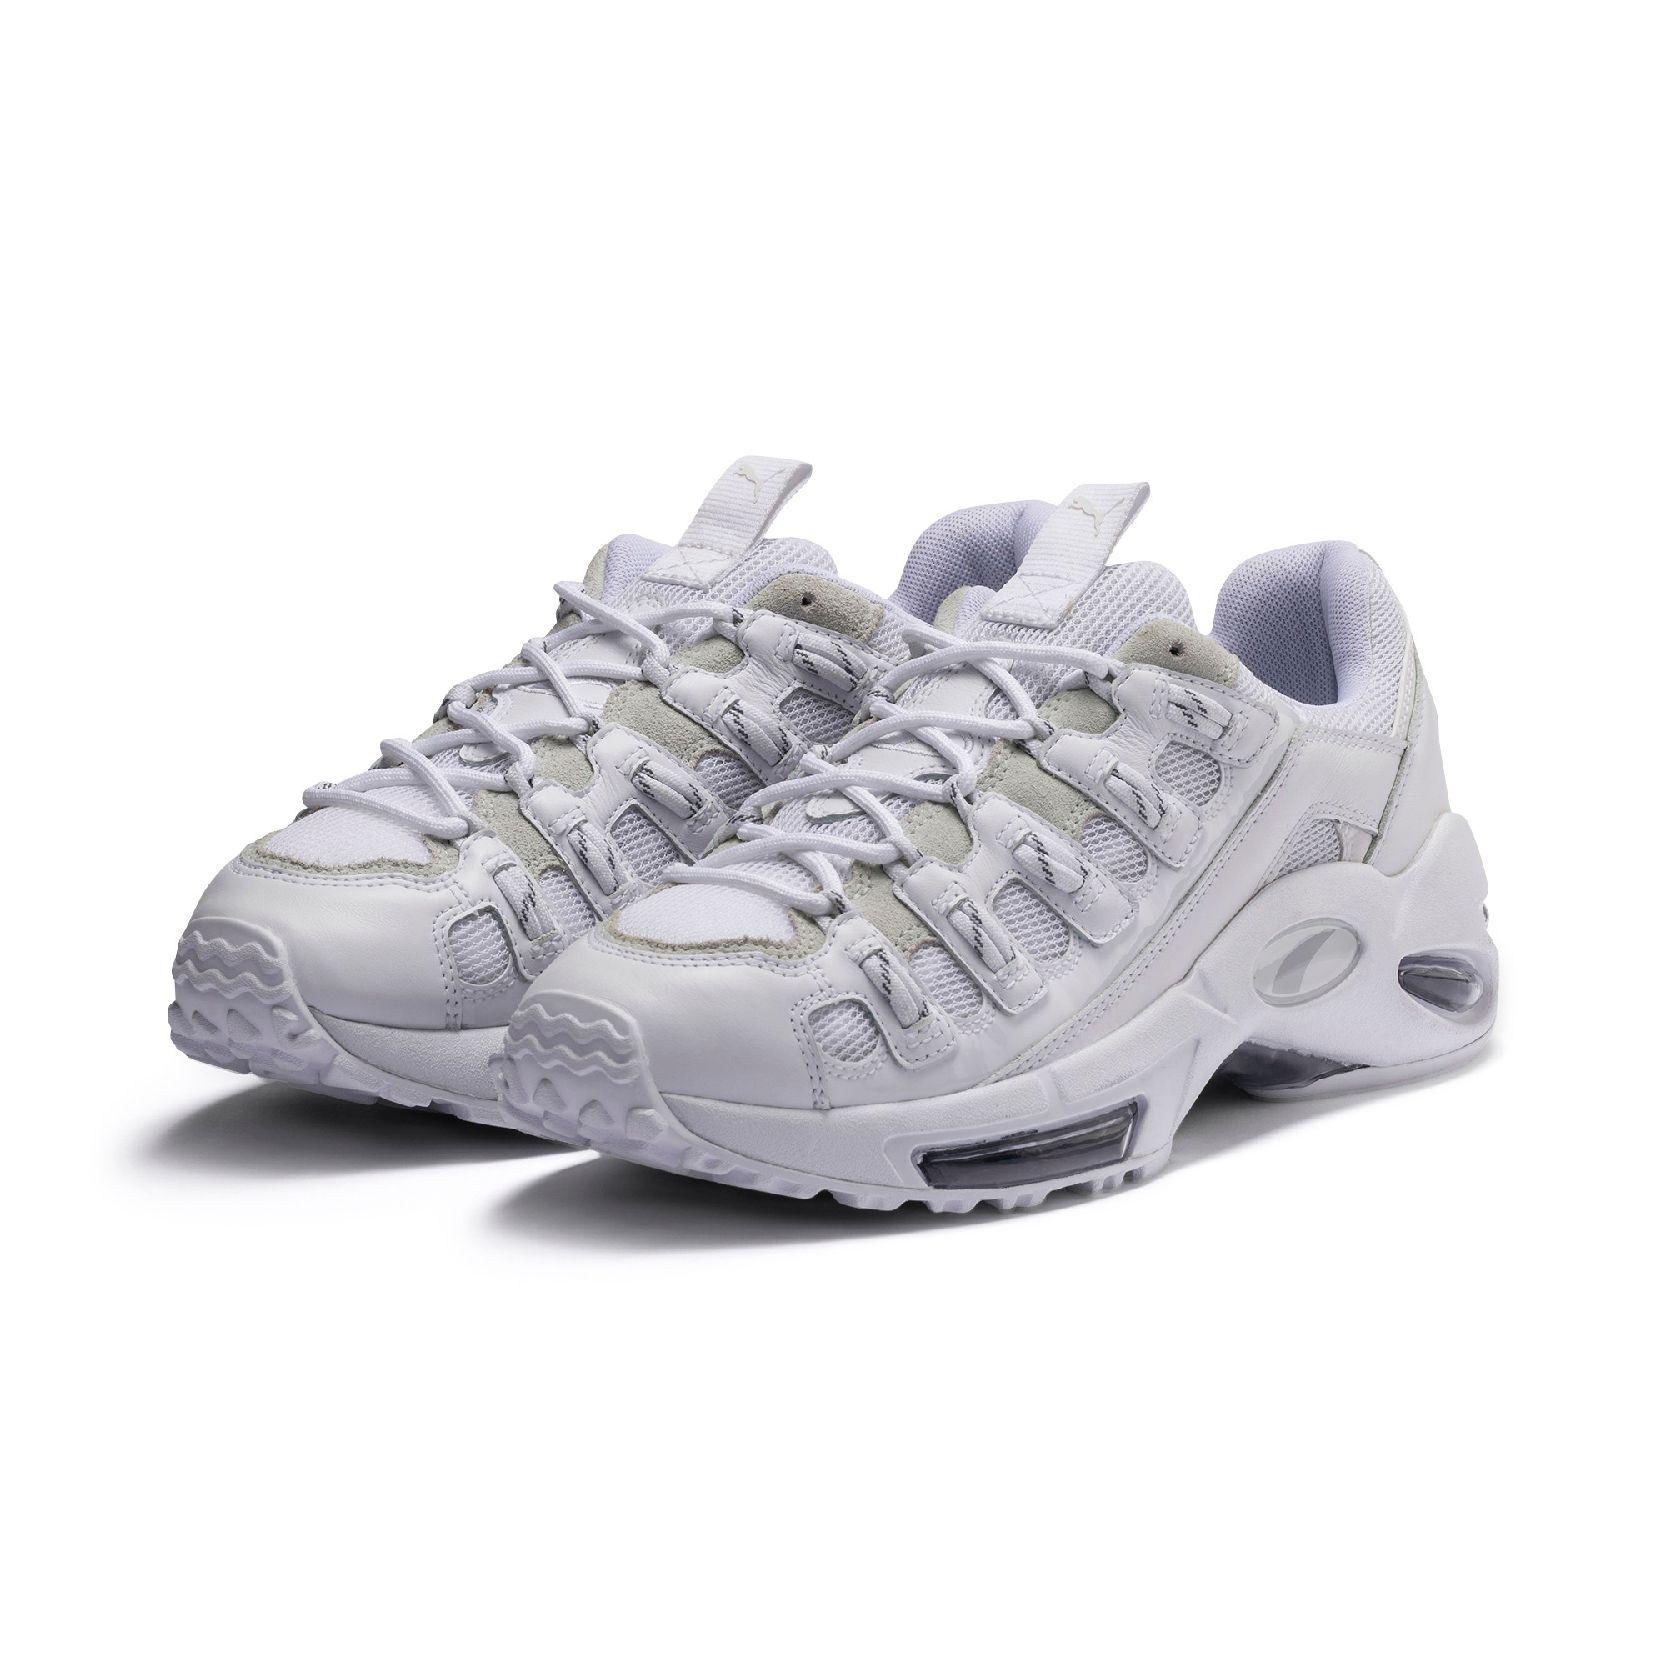 4ff86d10 Puma Cell Endura Reflective Puma White Sneaker in 2019 | кроссовки ...